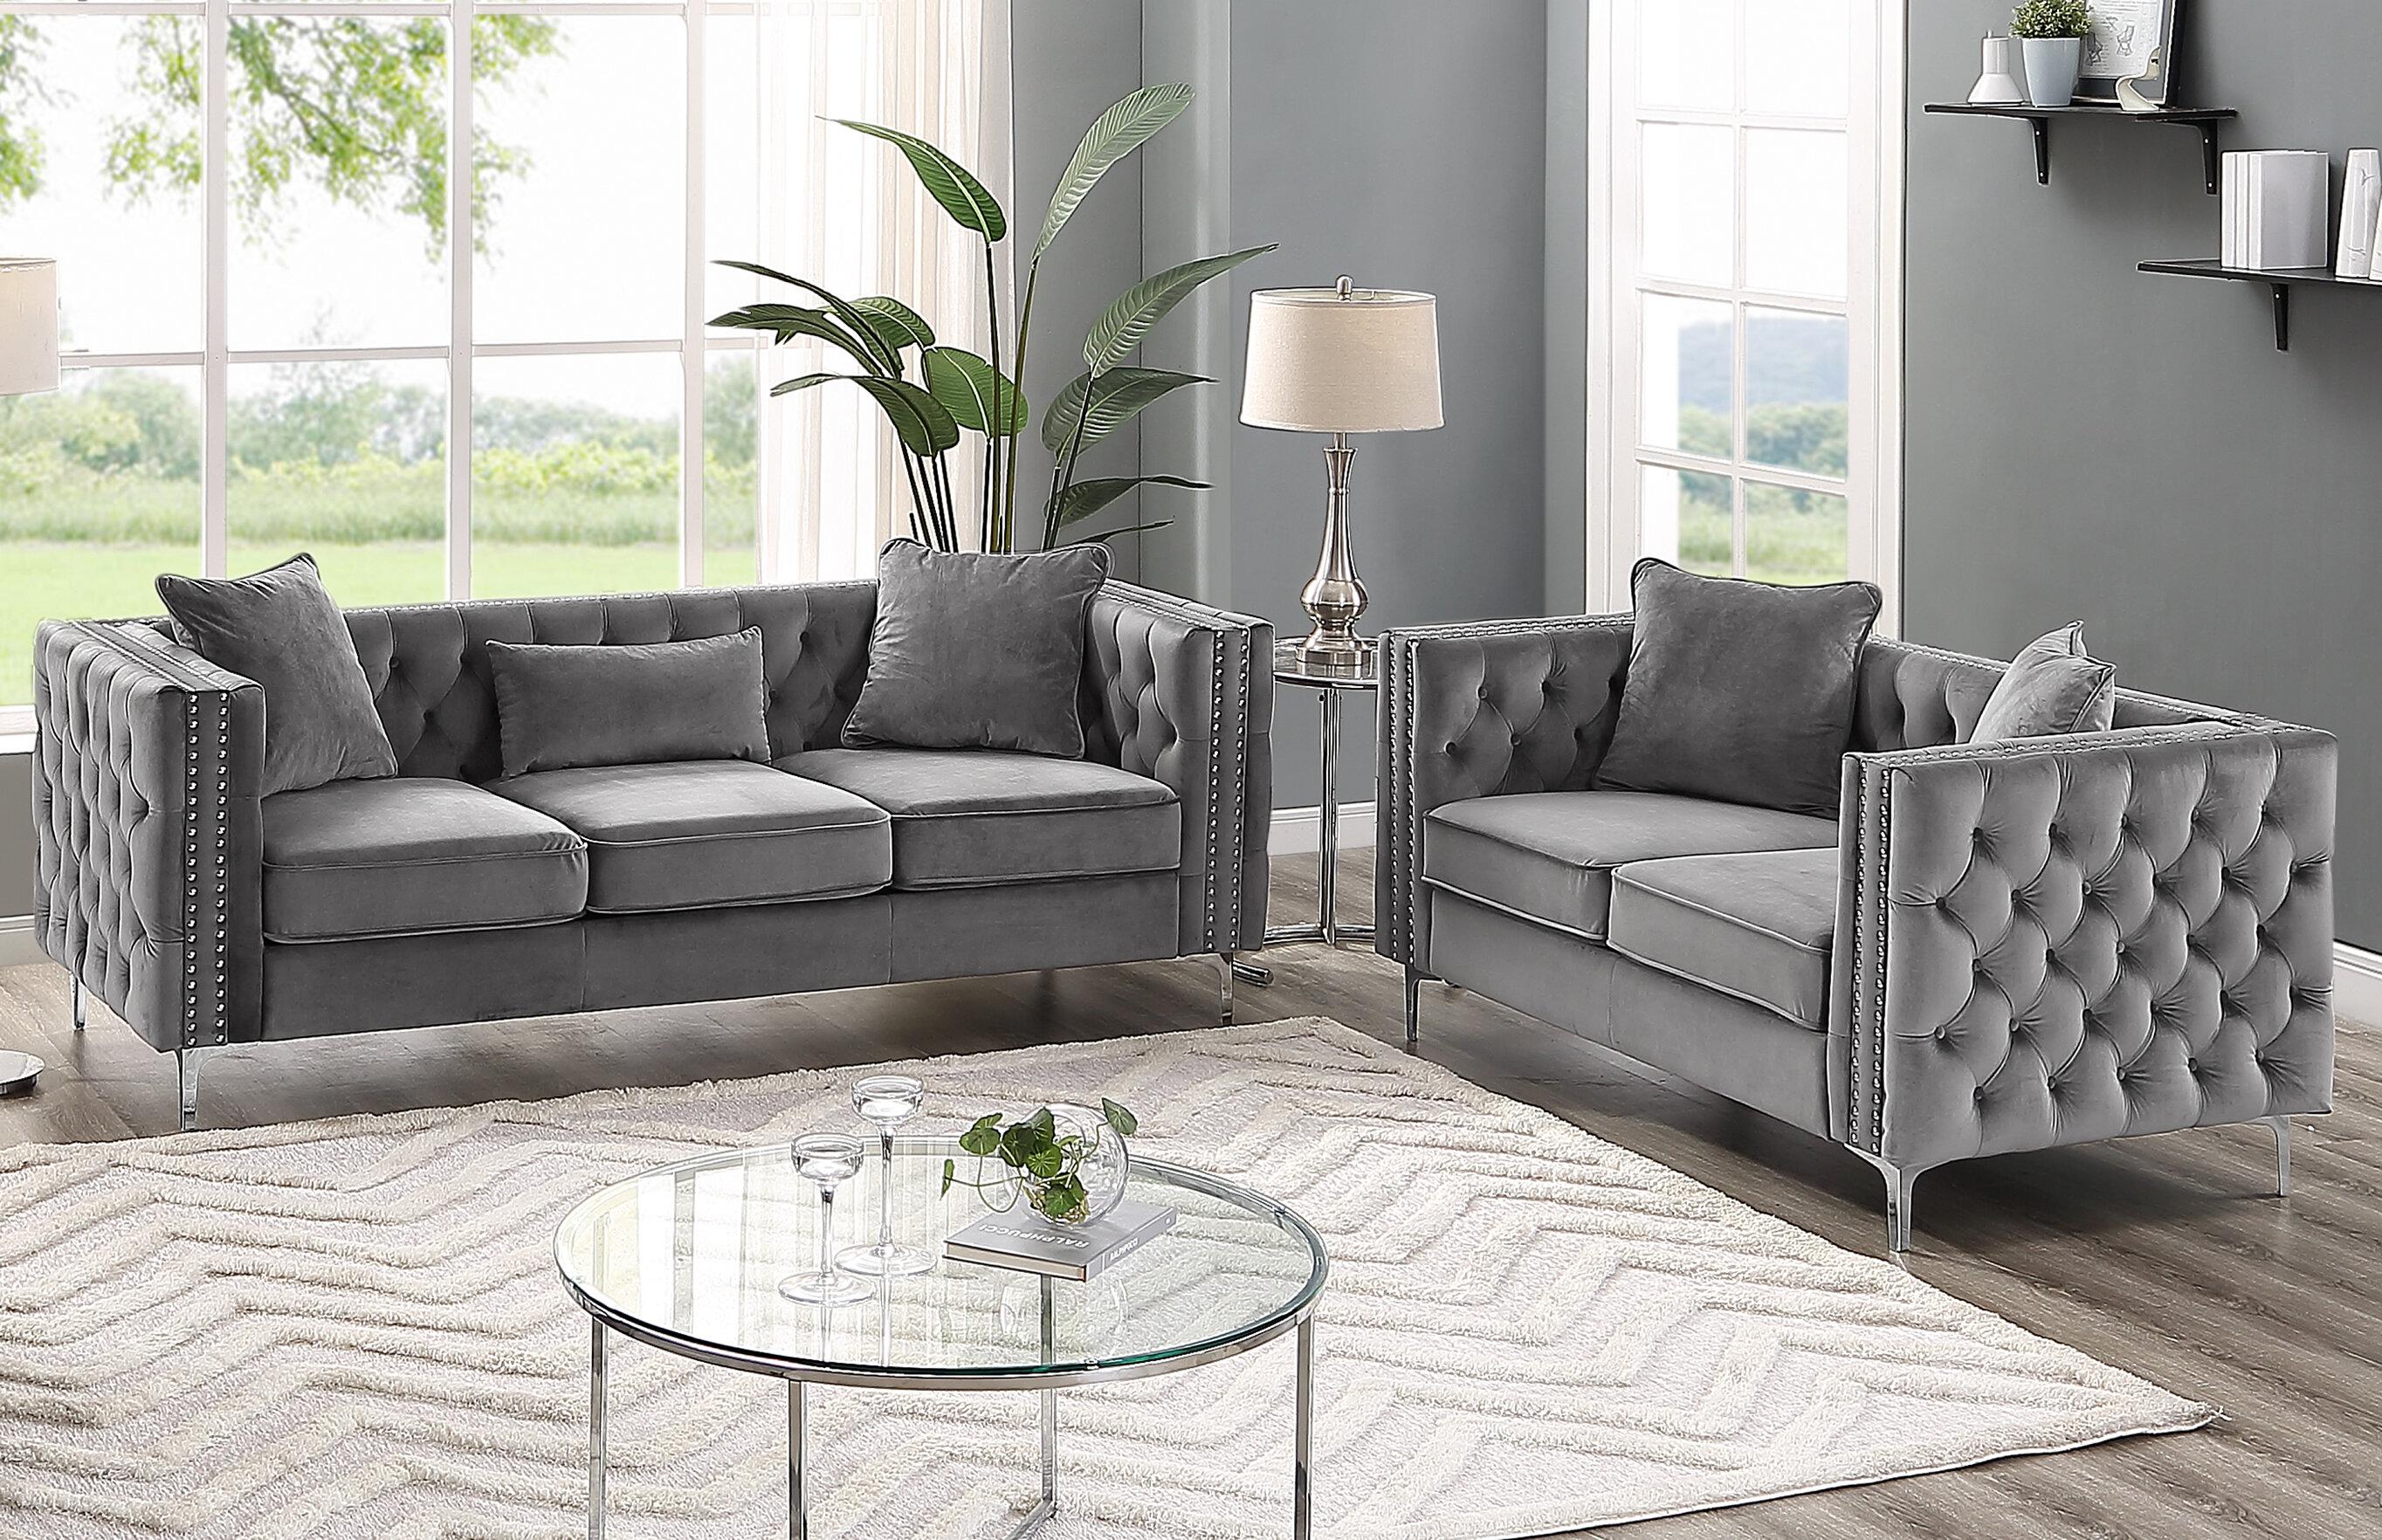 Grey Living Room Sets You\'ll Love in 2019 | Wayfair